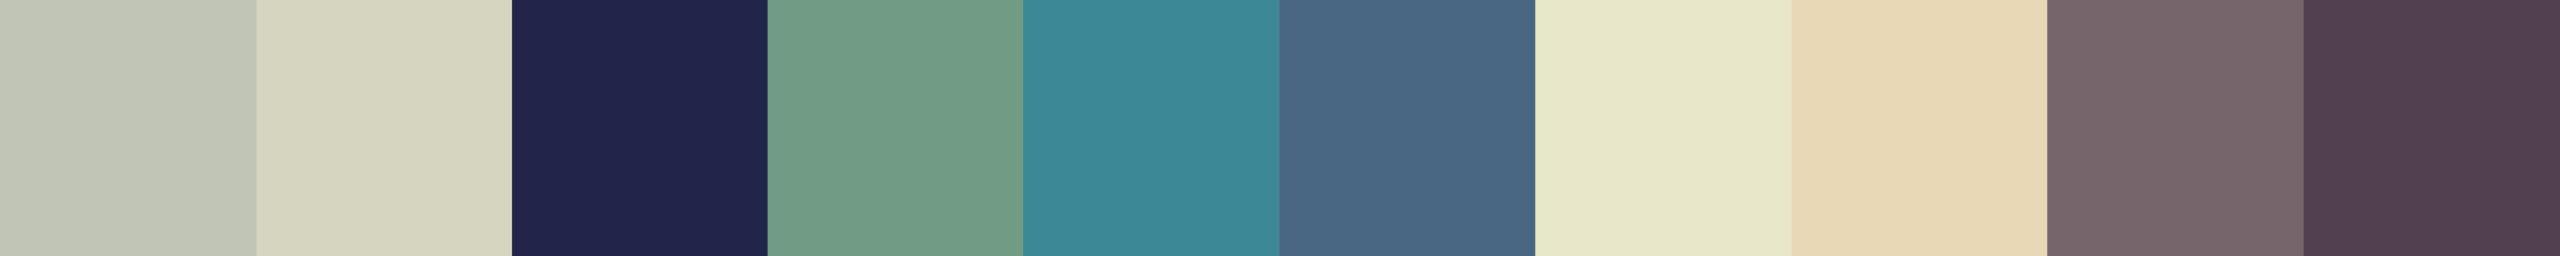 297 Apohephia Color Palette